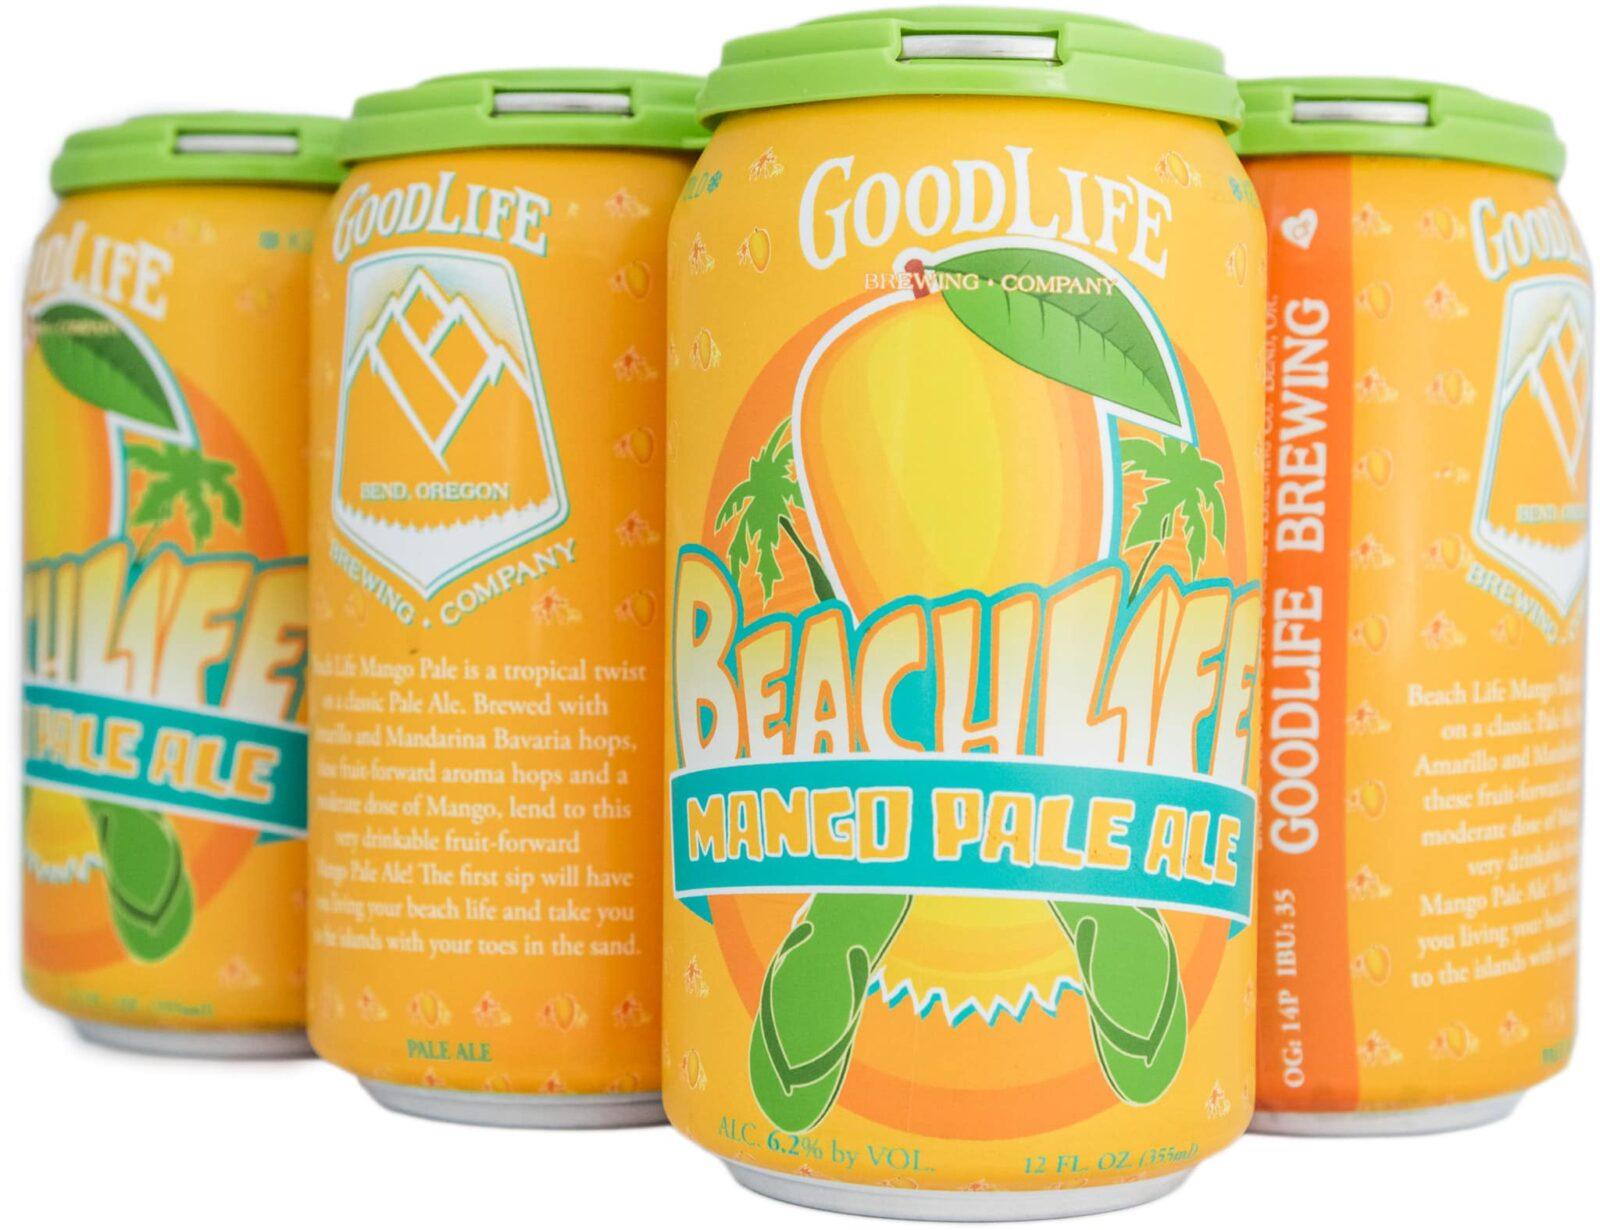 Beach Life Mango Pale Ale six pack